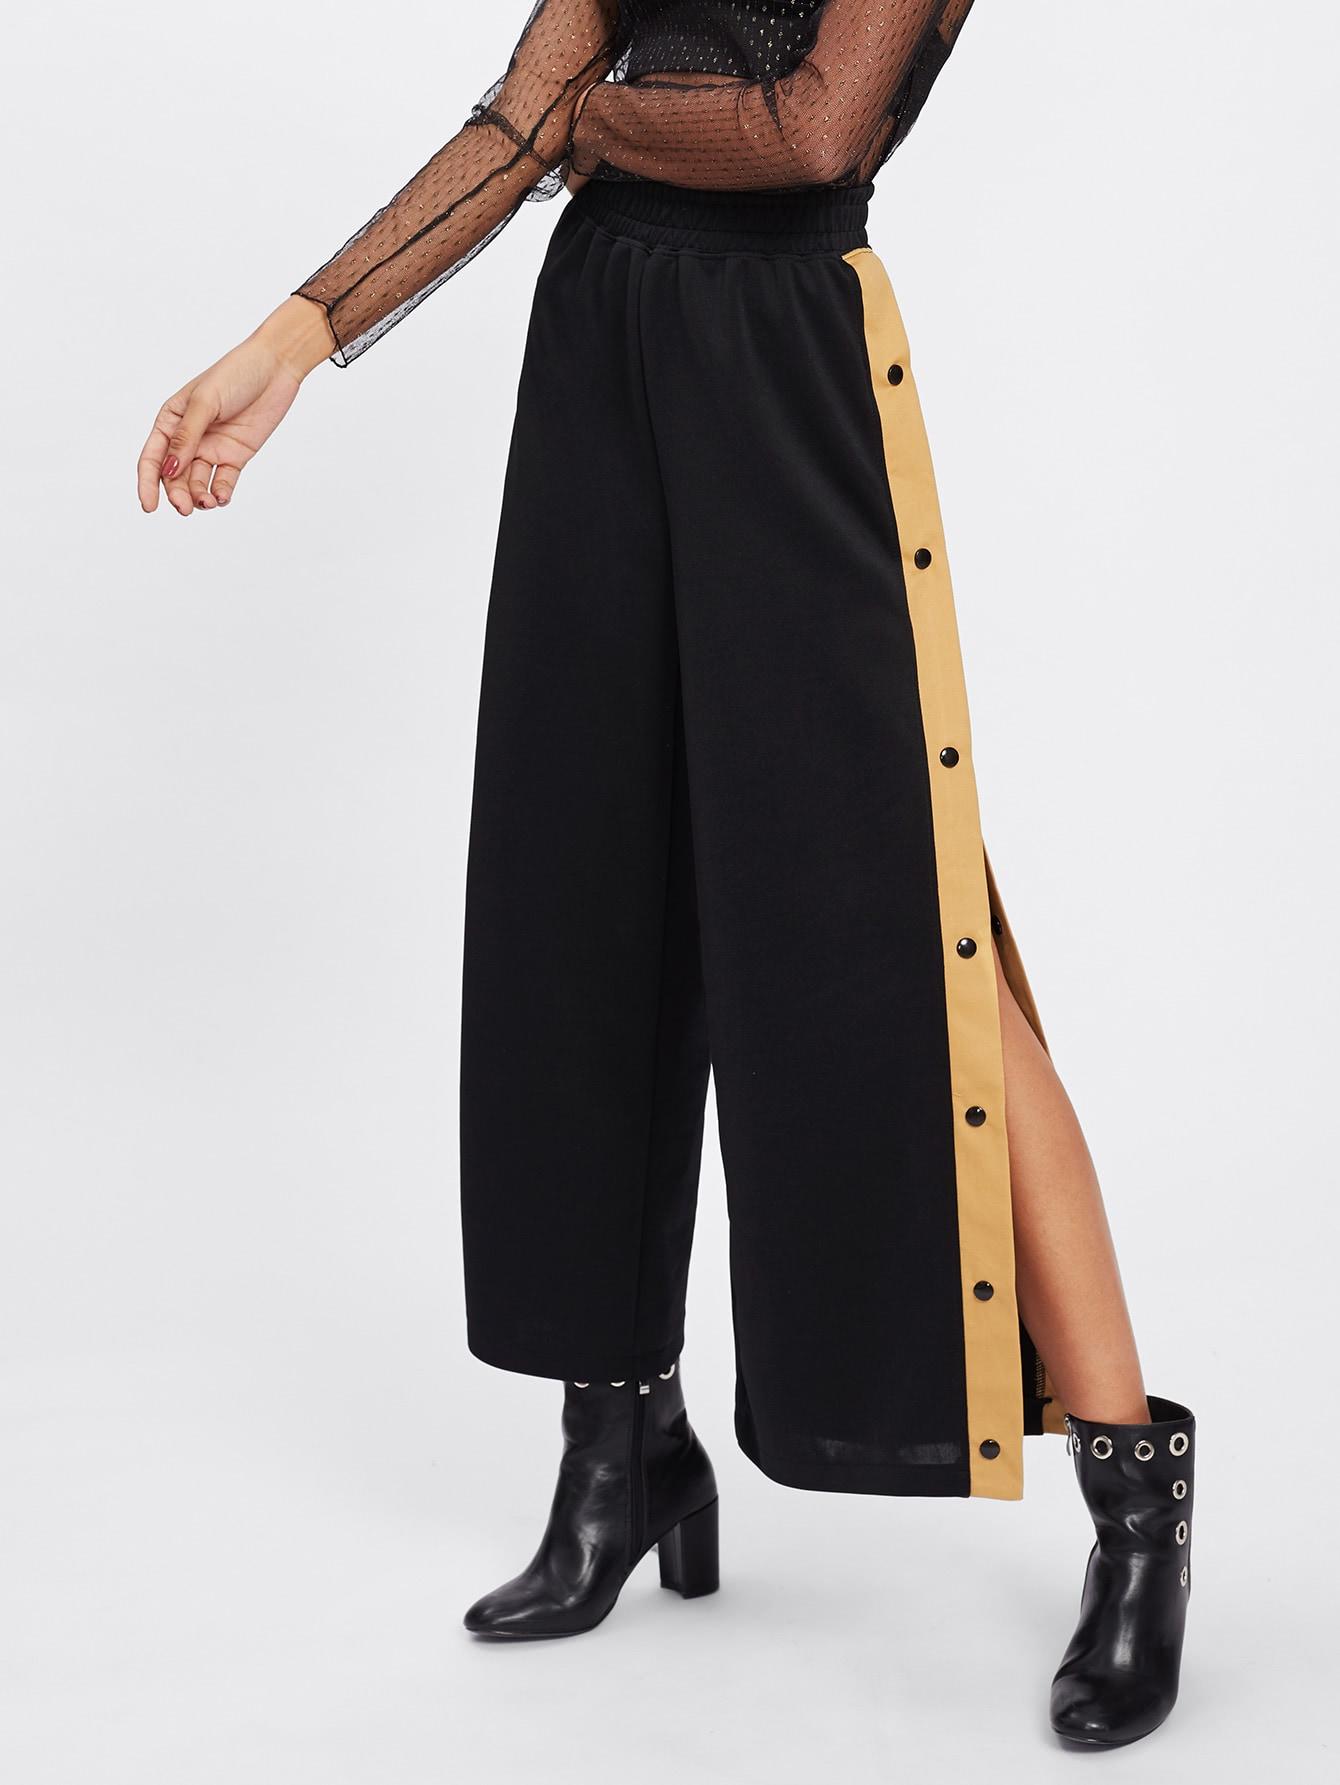 Contrast Snap Button Side Culotte Pants snap button striped side pants